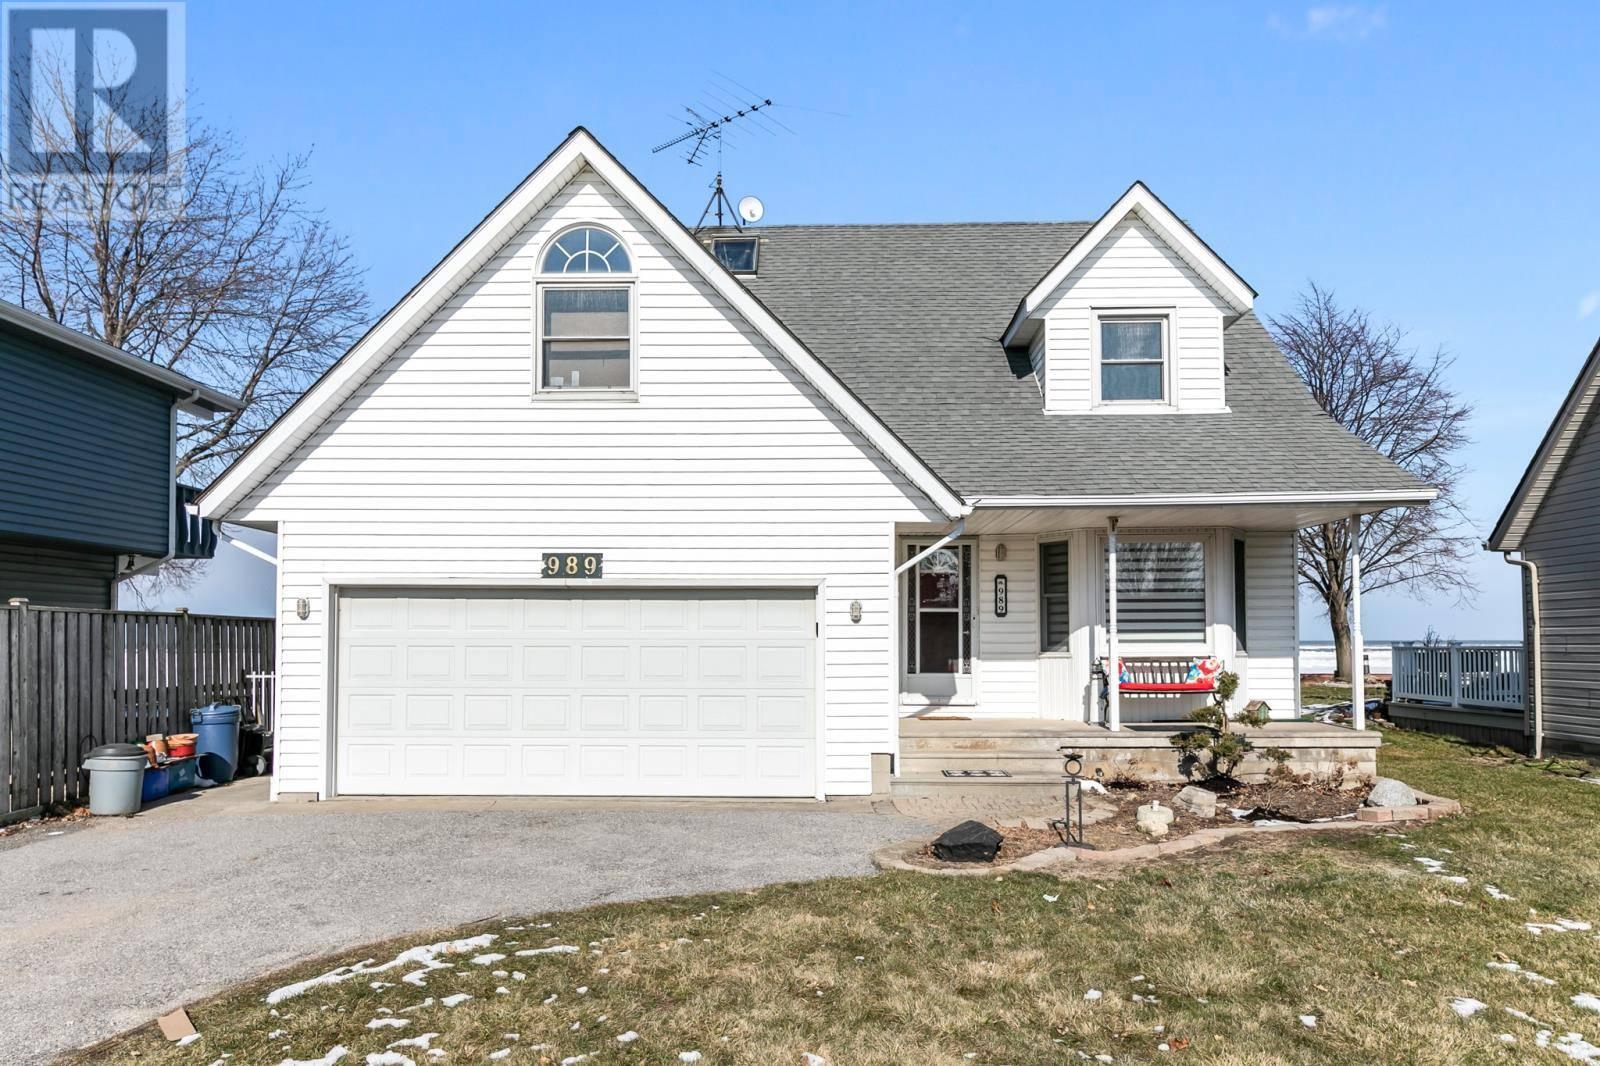 House for sale at 989 Lakeshore Park  Lakeshore Ontario - MLS: 20001714